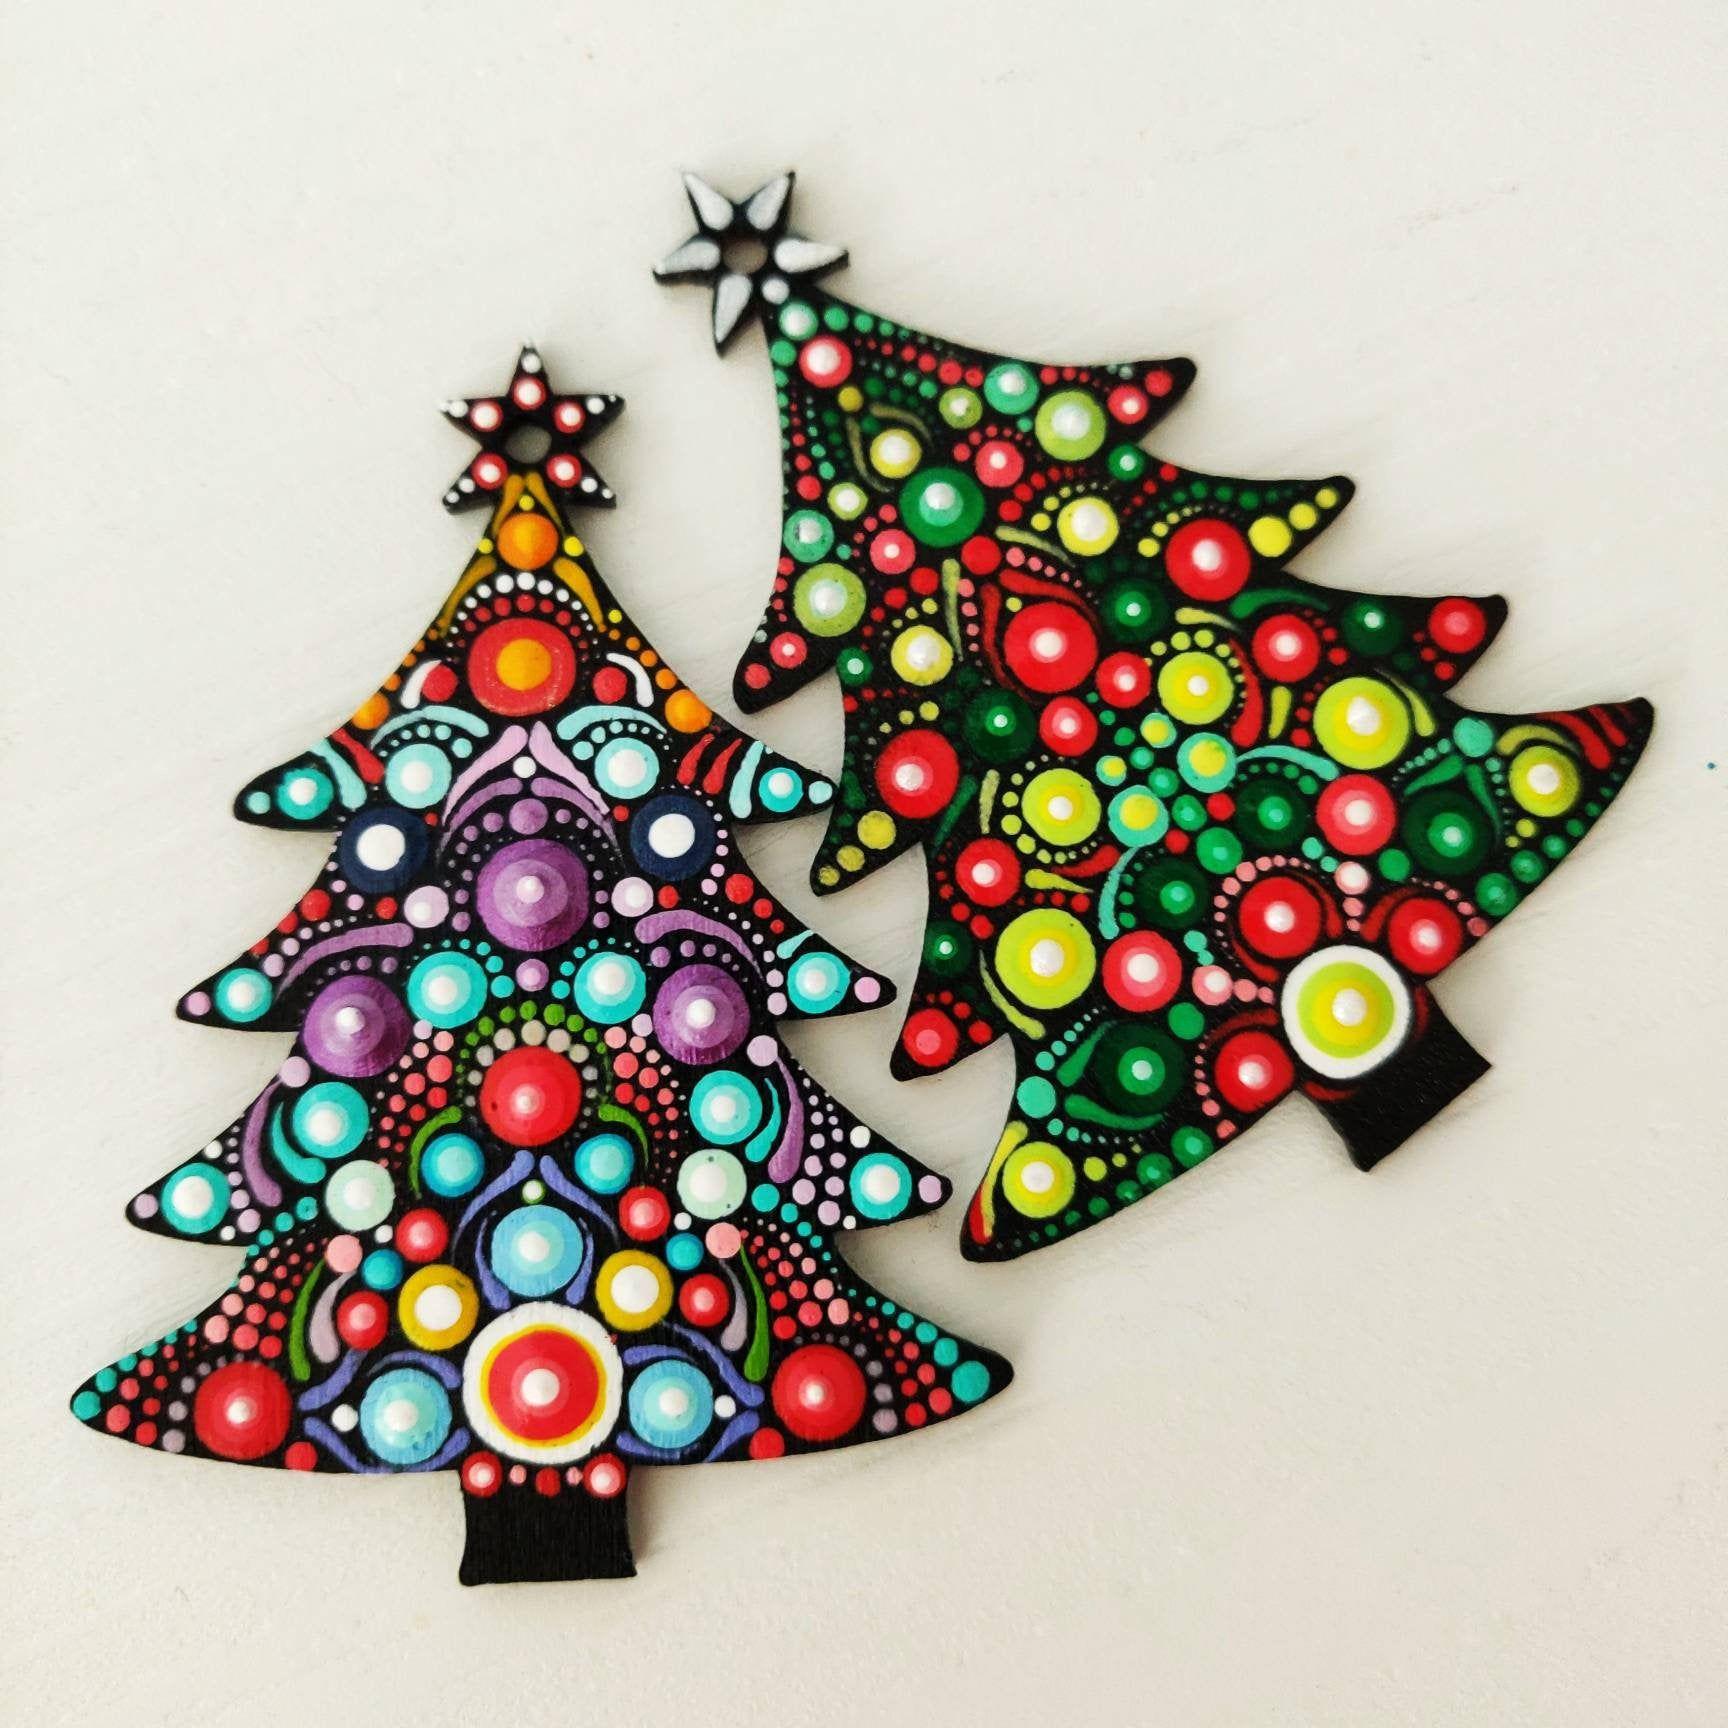 Custom Christmas Tree Ornaments On Wood In Shape Of A Tree Mandala On Christmas Ornaments Dotart Dotilism Pointilism Christm Christmas Paintings Christmas Tree Painting Christmas Mandala